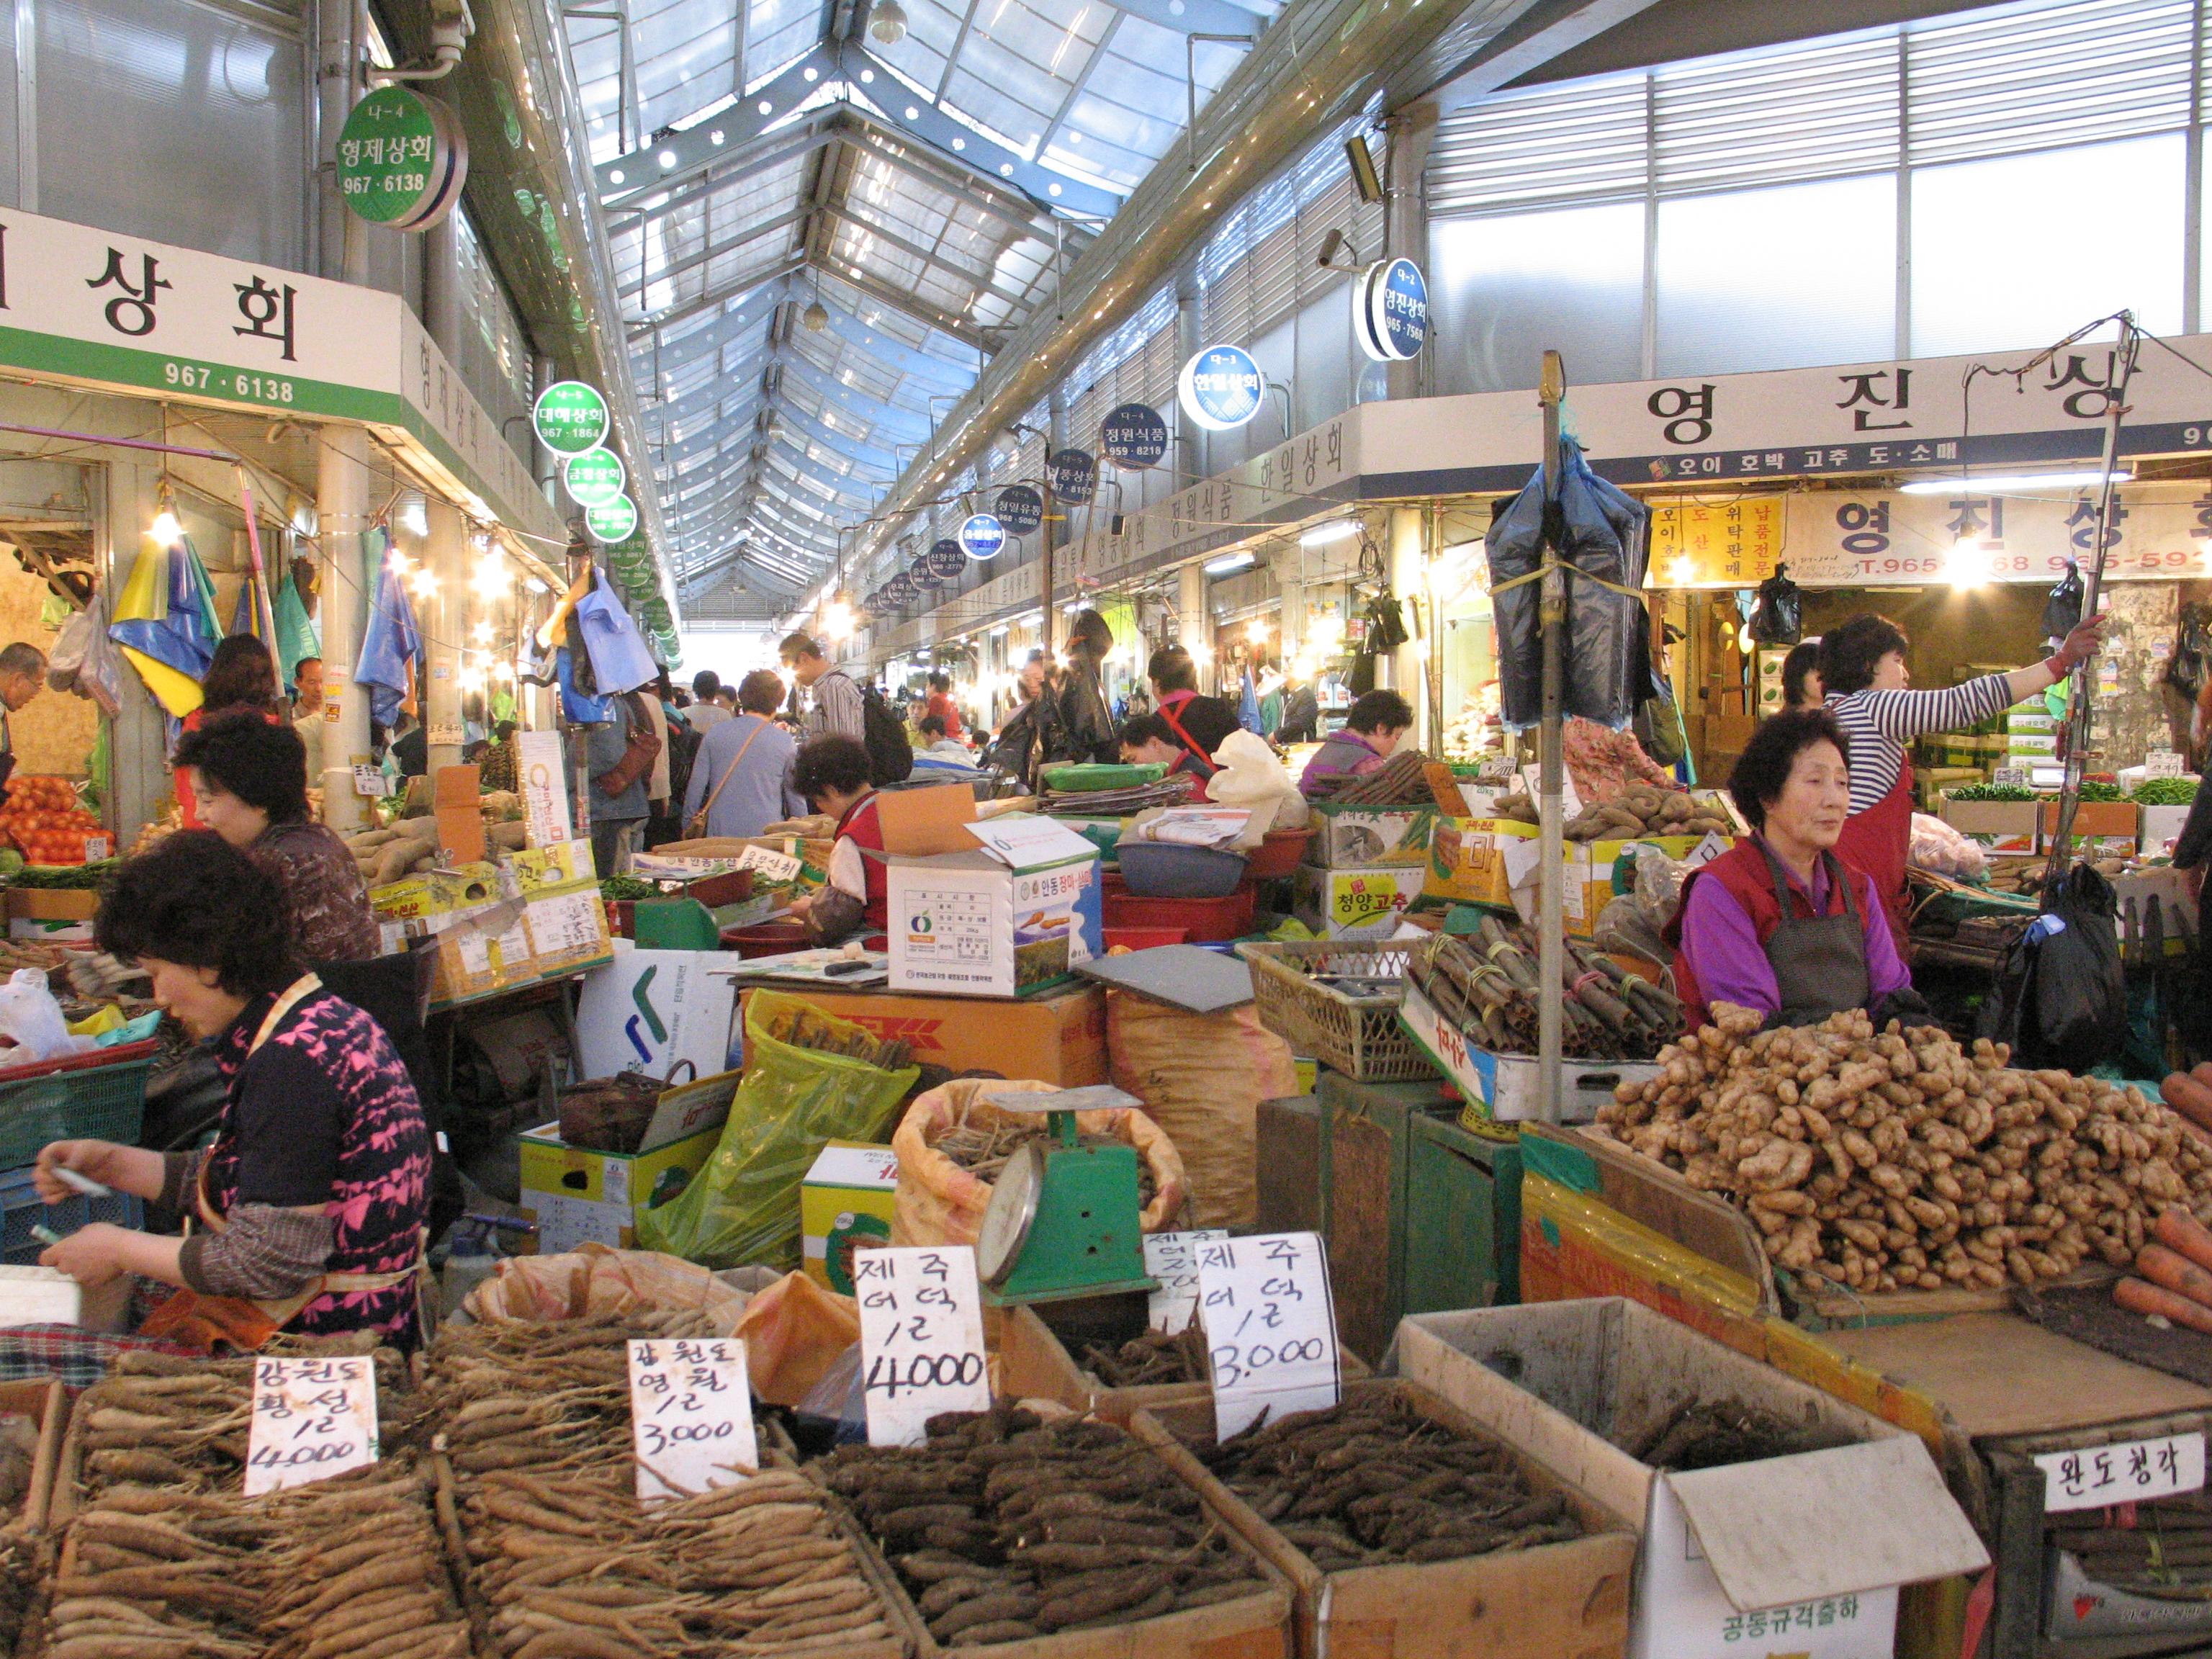 File:Korea-Seoul-Gyeongdong Market-02.jpg - Wikimedia Commons